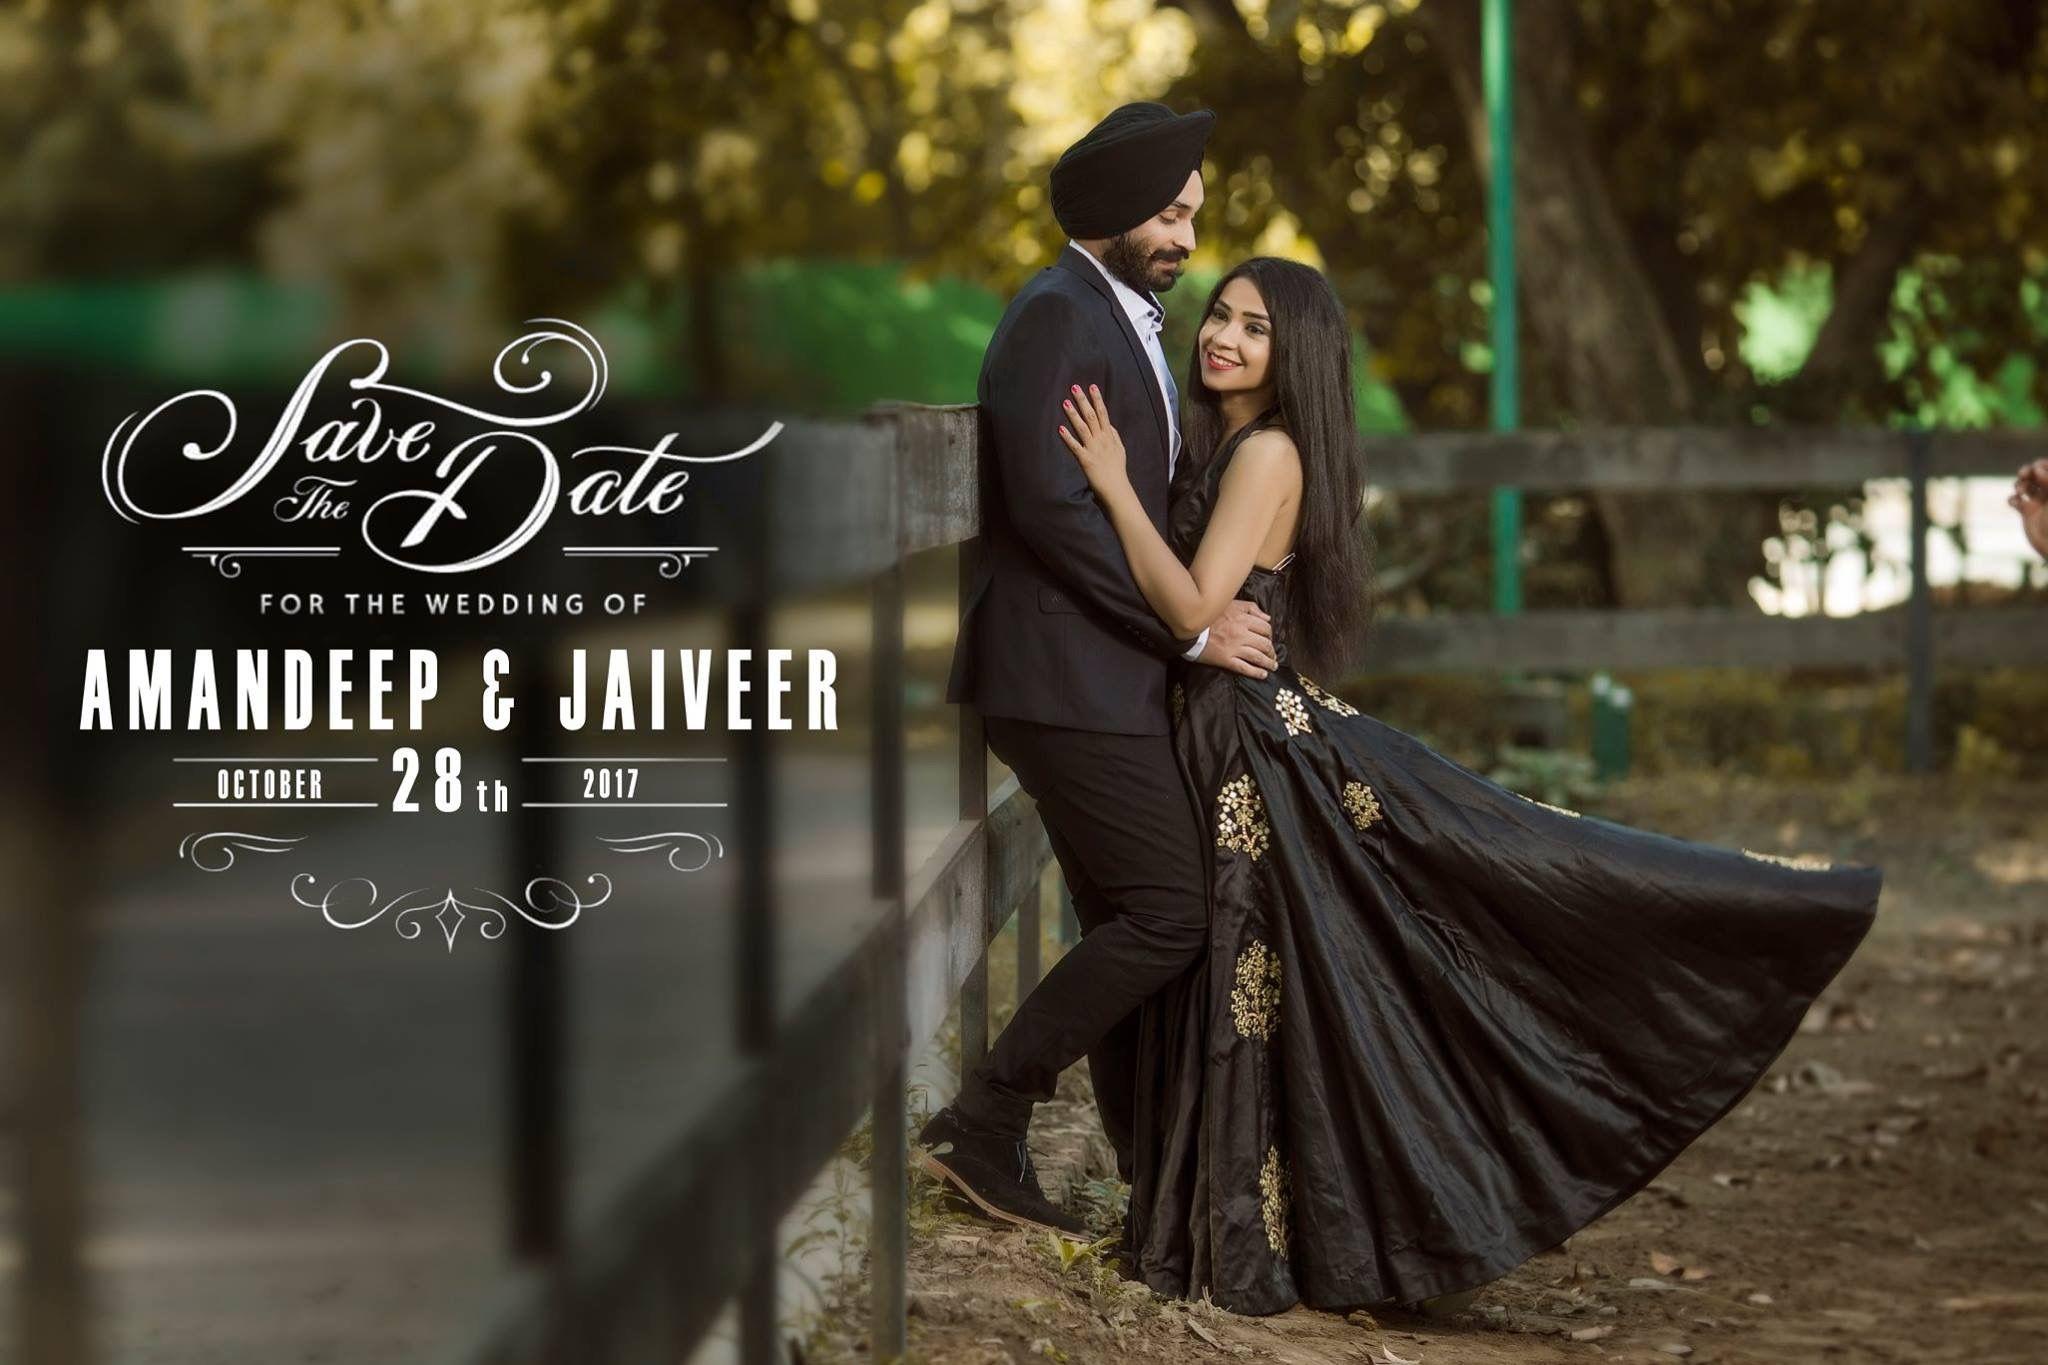 Pin By Afsha Kasgar On Wedding Couple Poses Photography Wedding Couple Poses Photography Pre Wedding Photoshoot Wedding Couple Poses